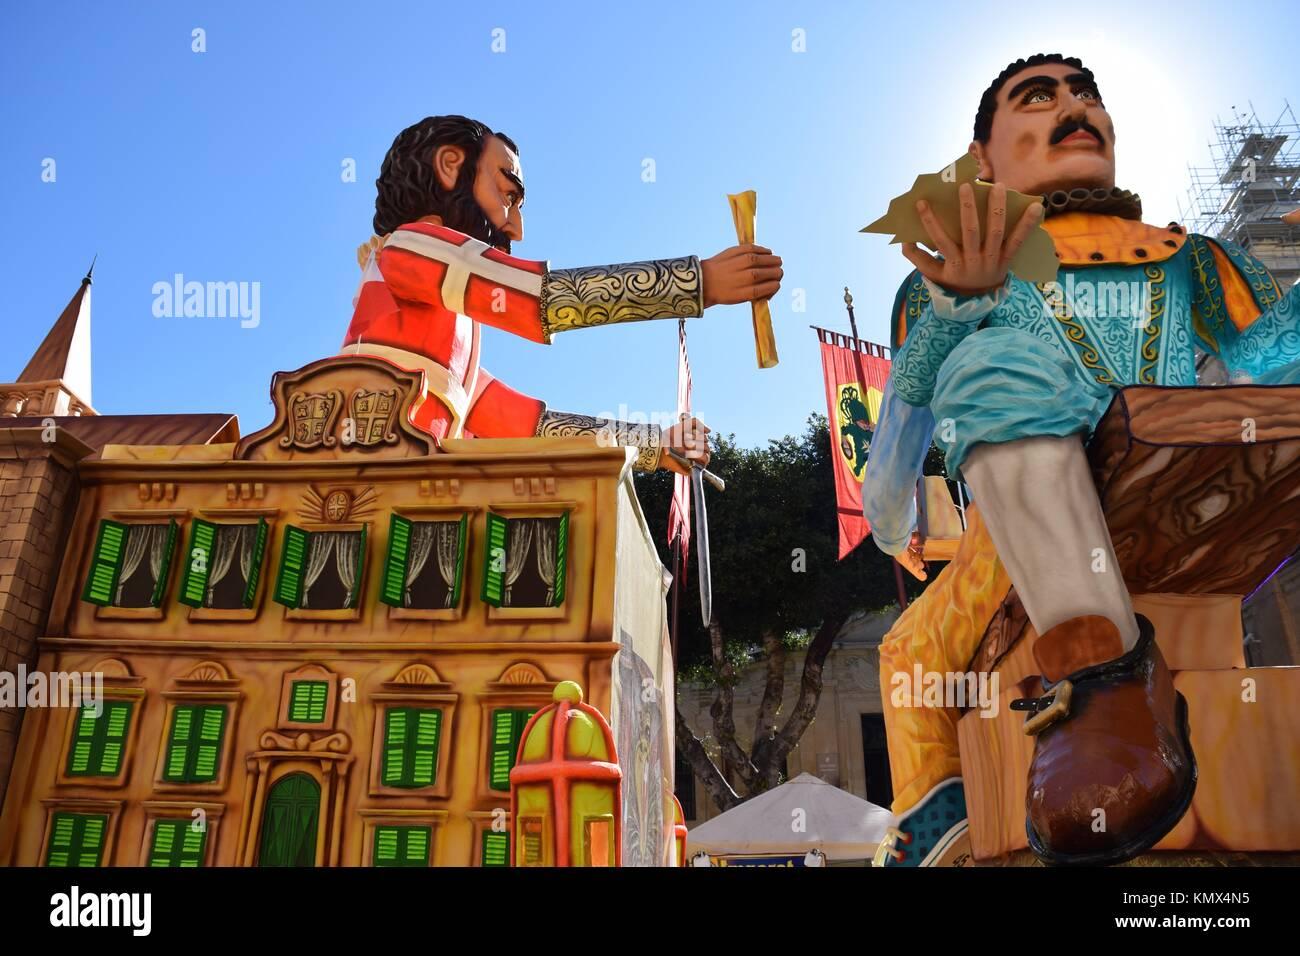 Royal float servants castle carnival - Stock Image